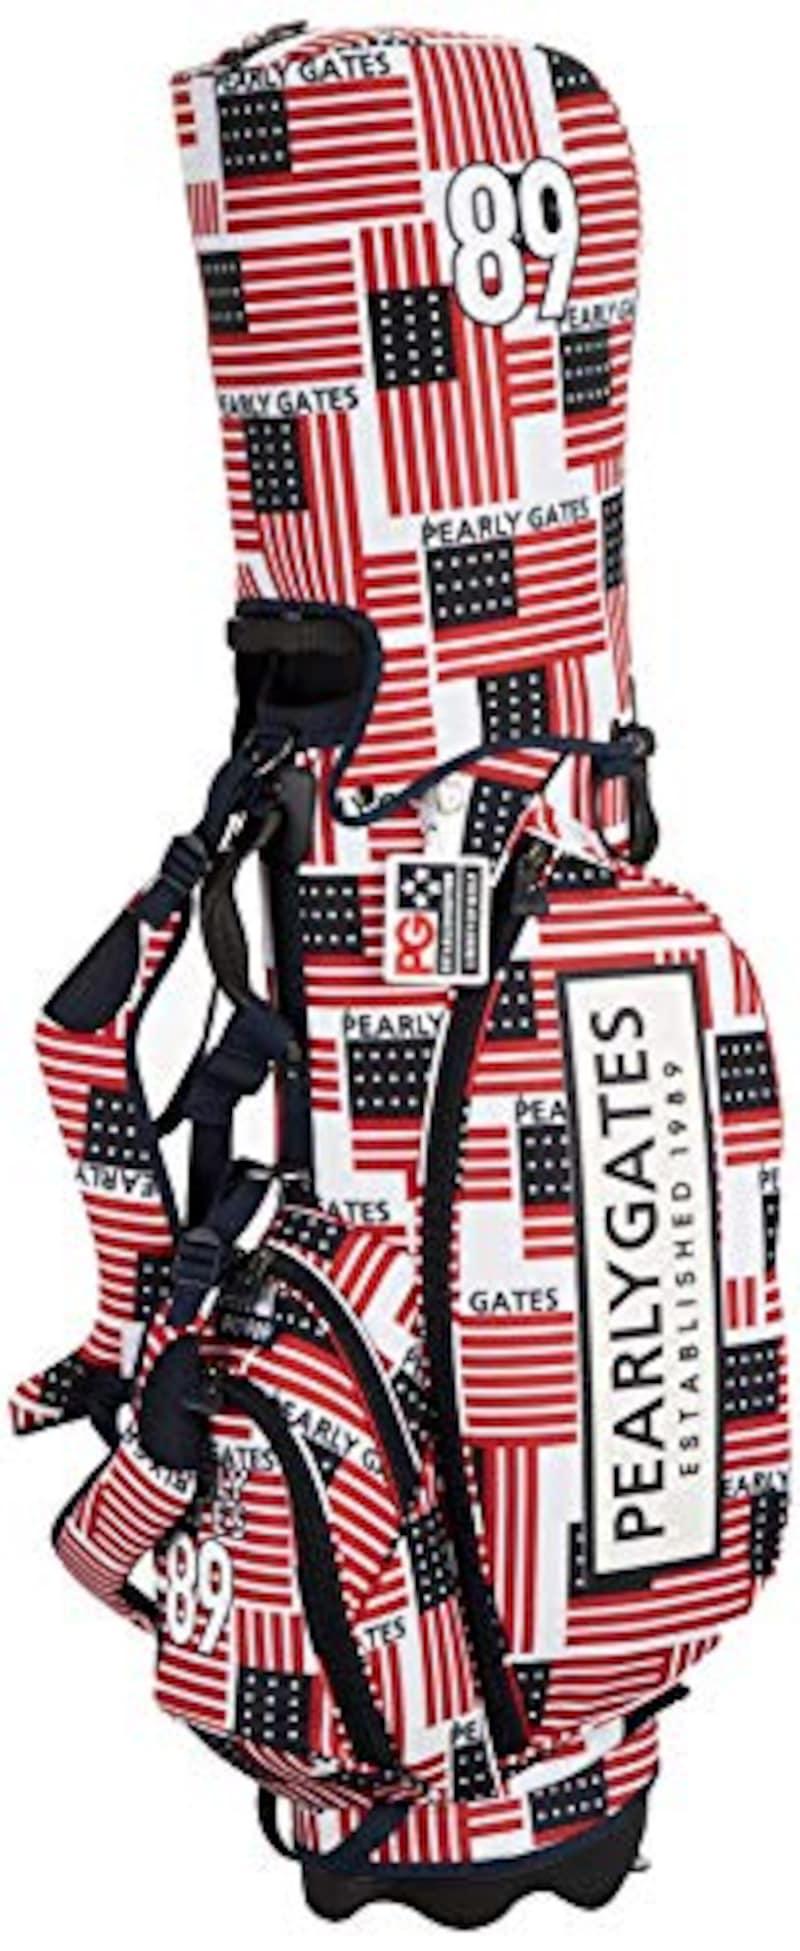 PEARLY GATES(パーリーゲイツ),ゴルフ用 キャディバッグ 星条旗総柄